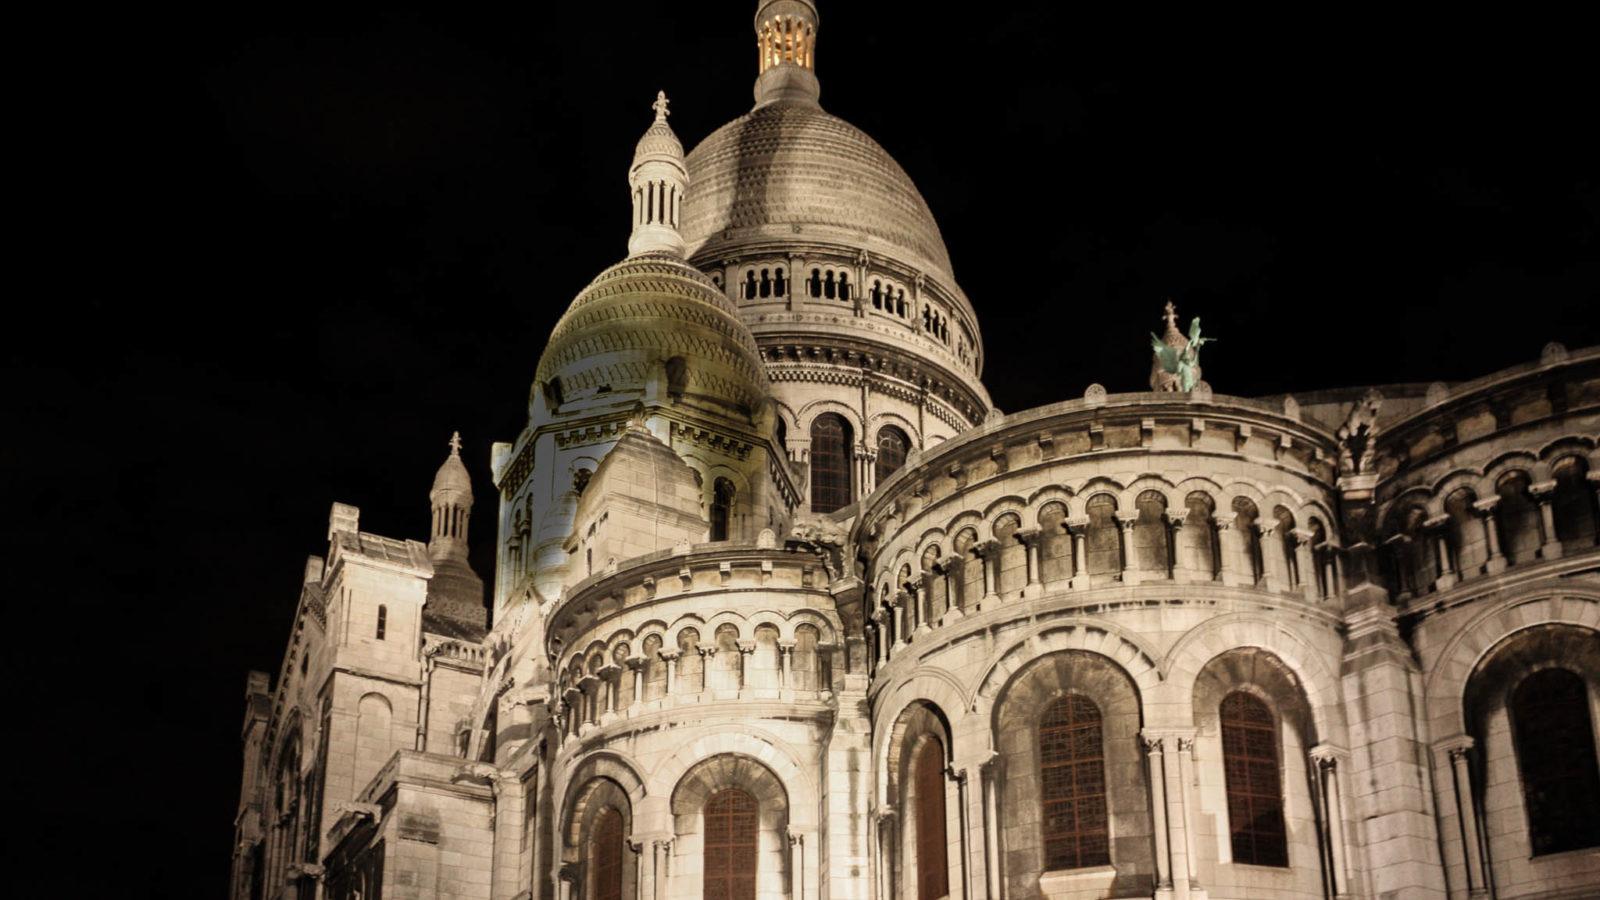 Sacré-Cœur, Paris representing Western Europe